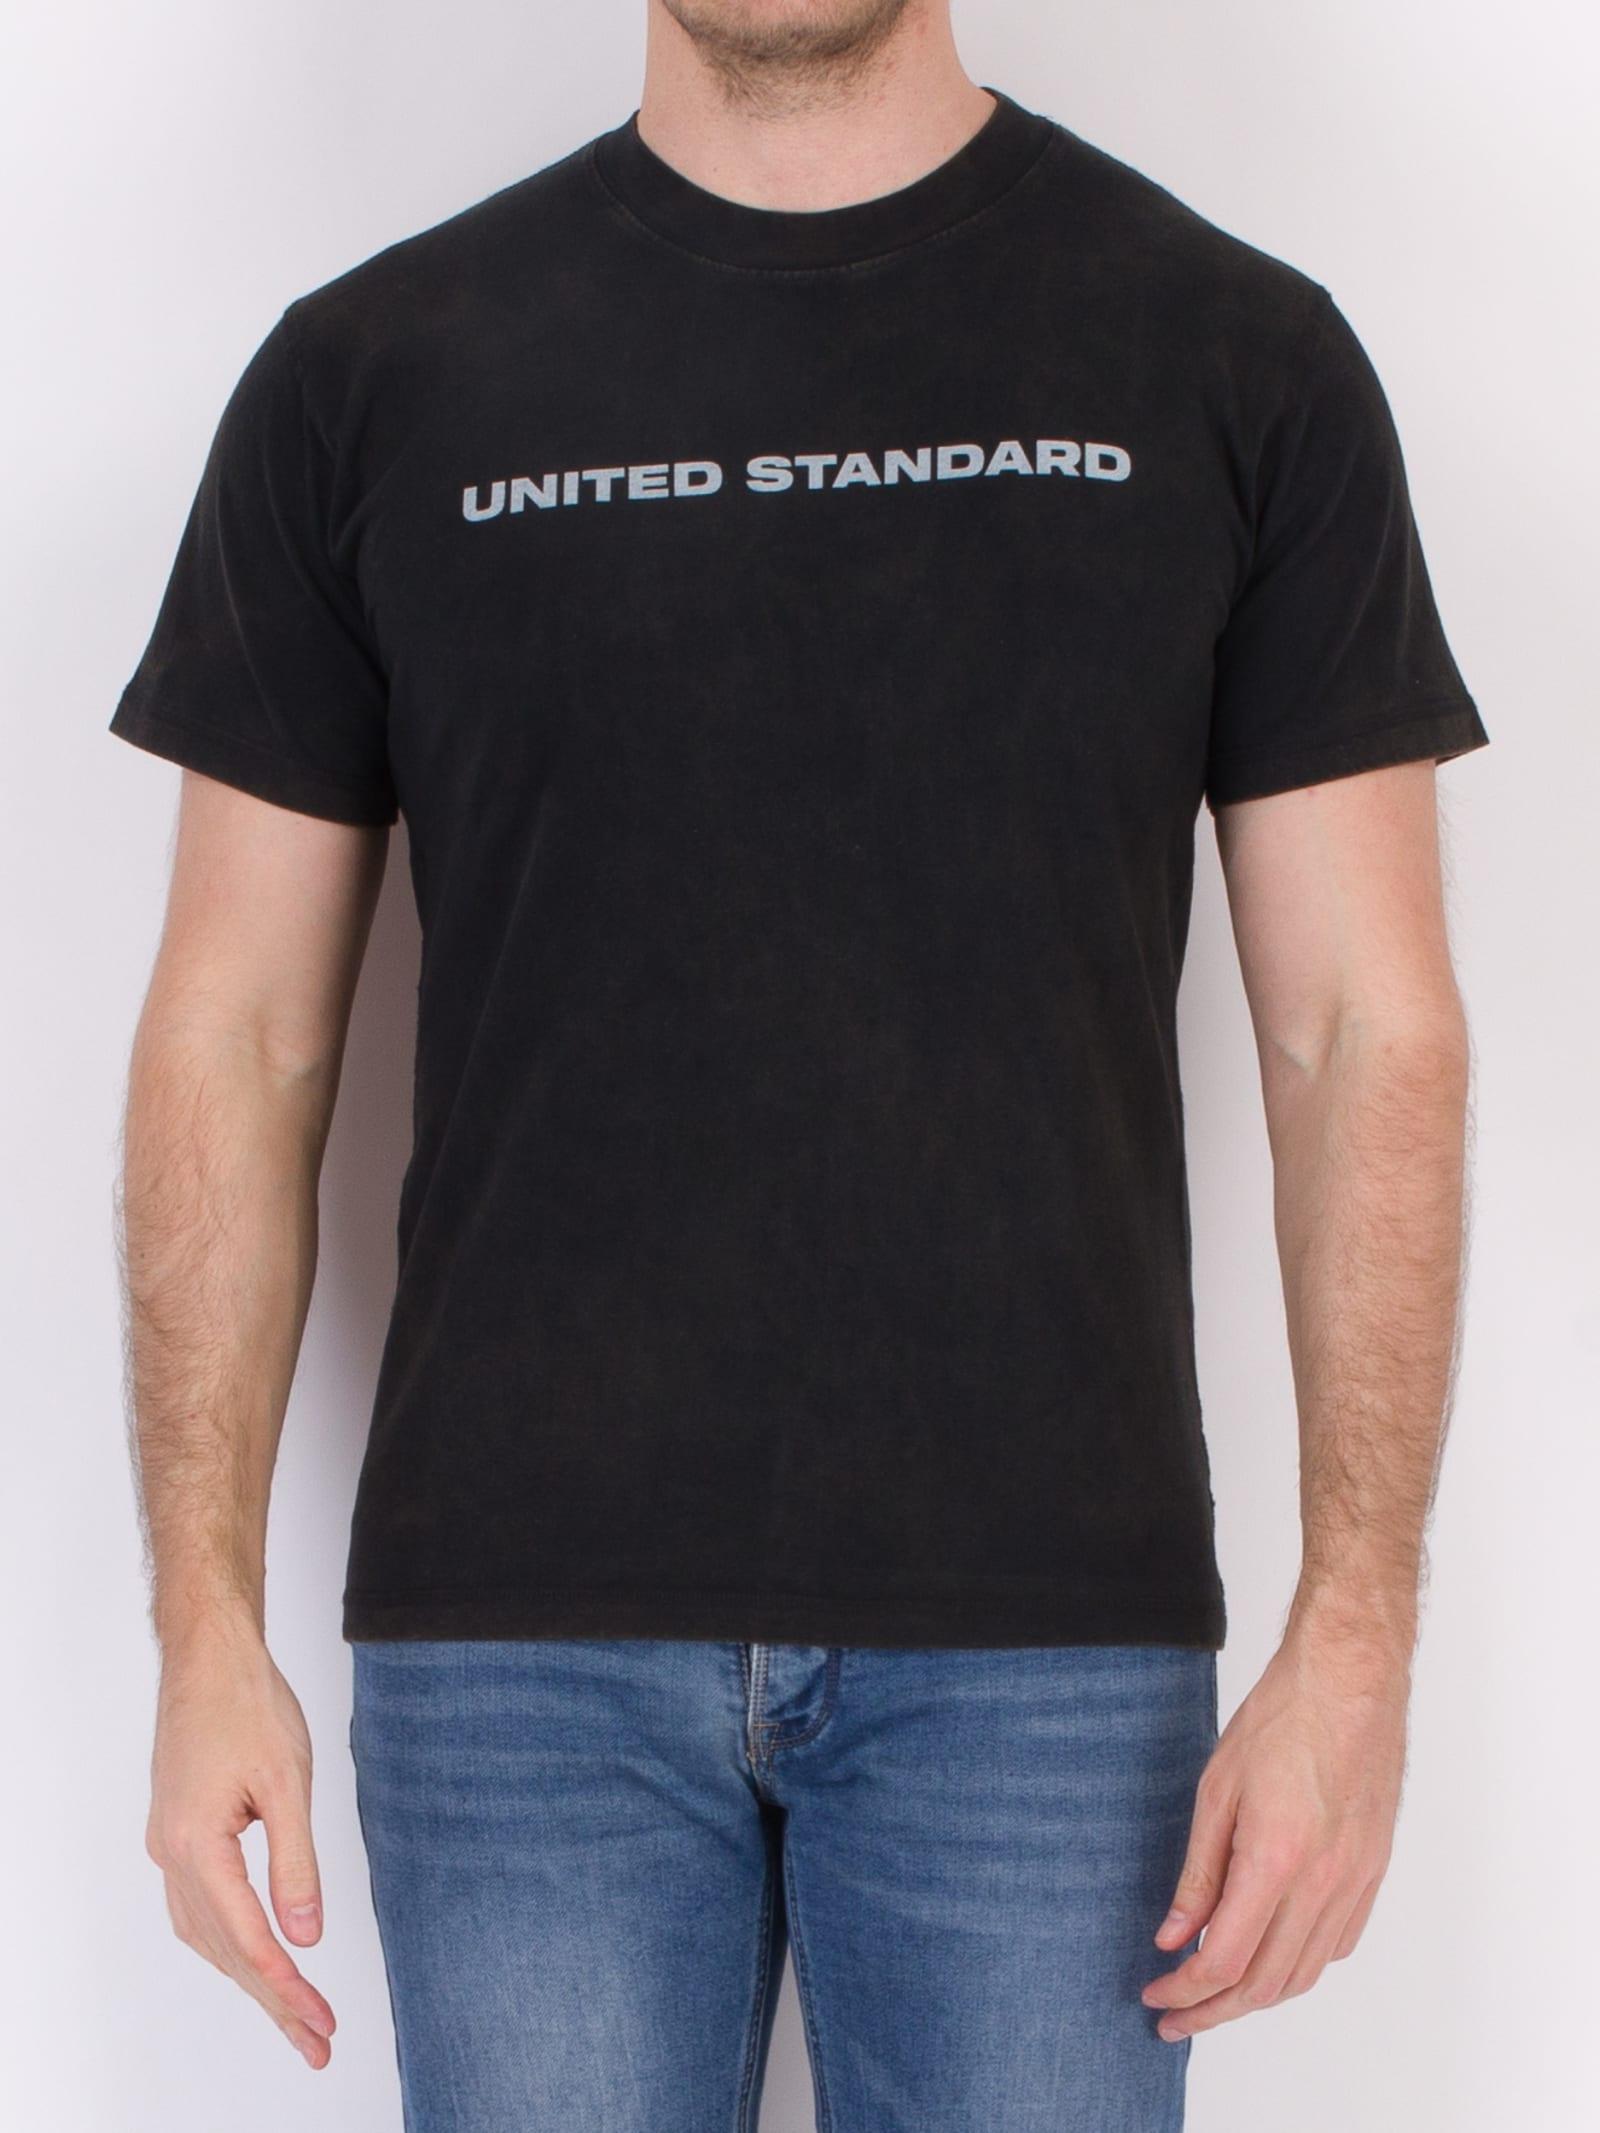 United Standard LOGO ACID T-SHIRT